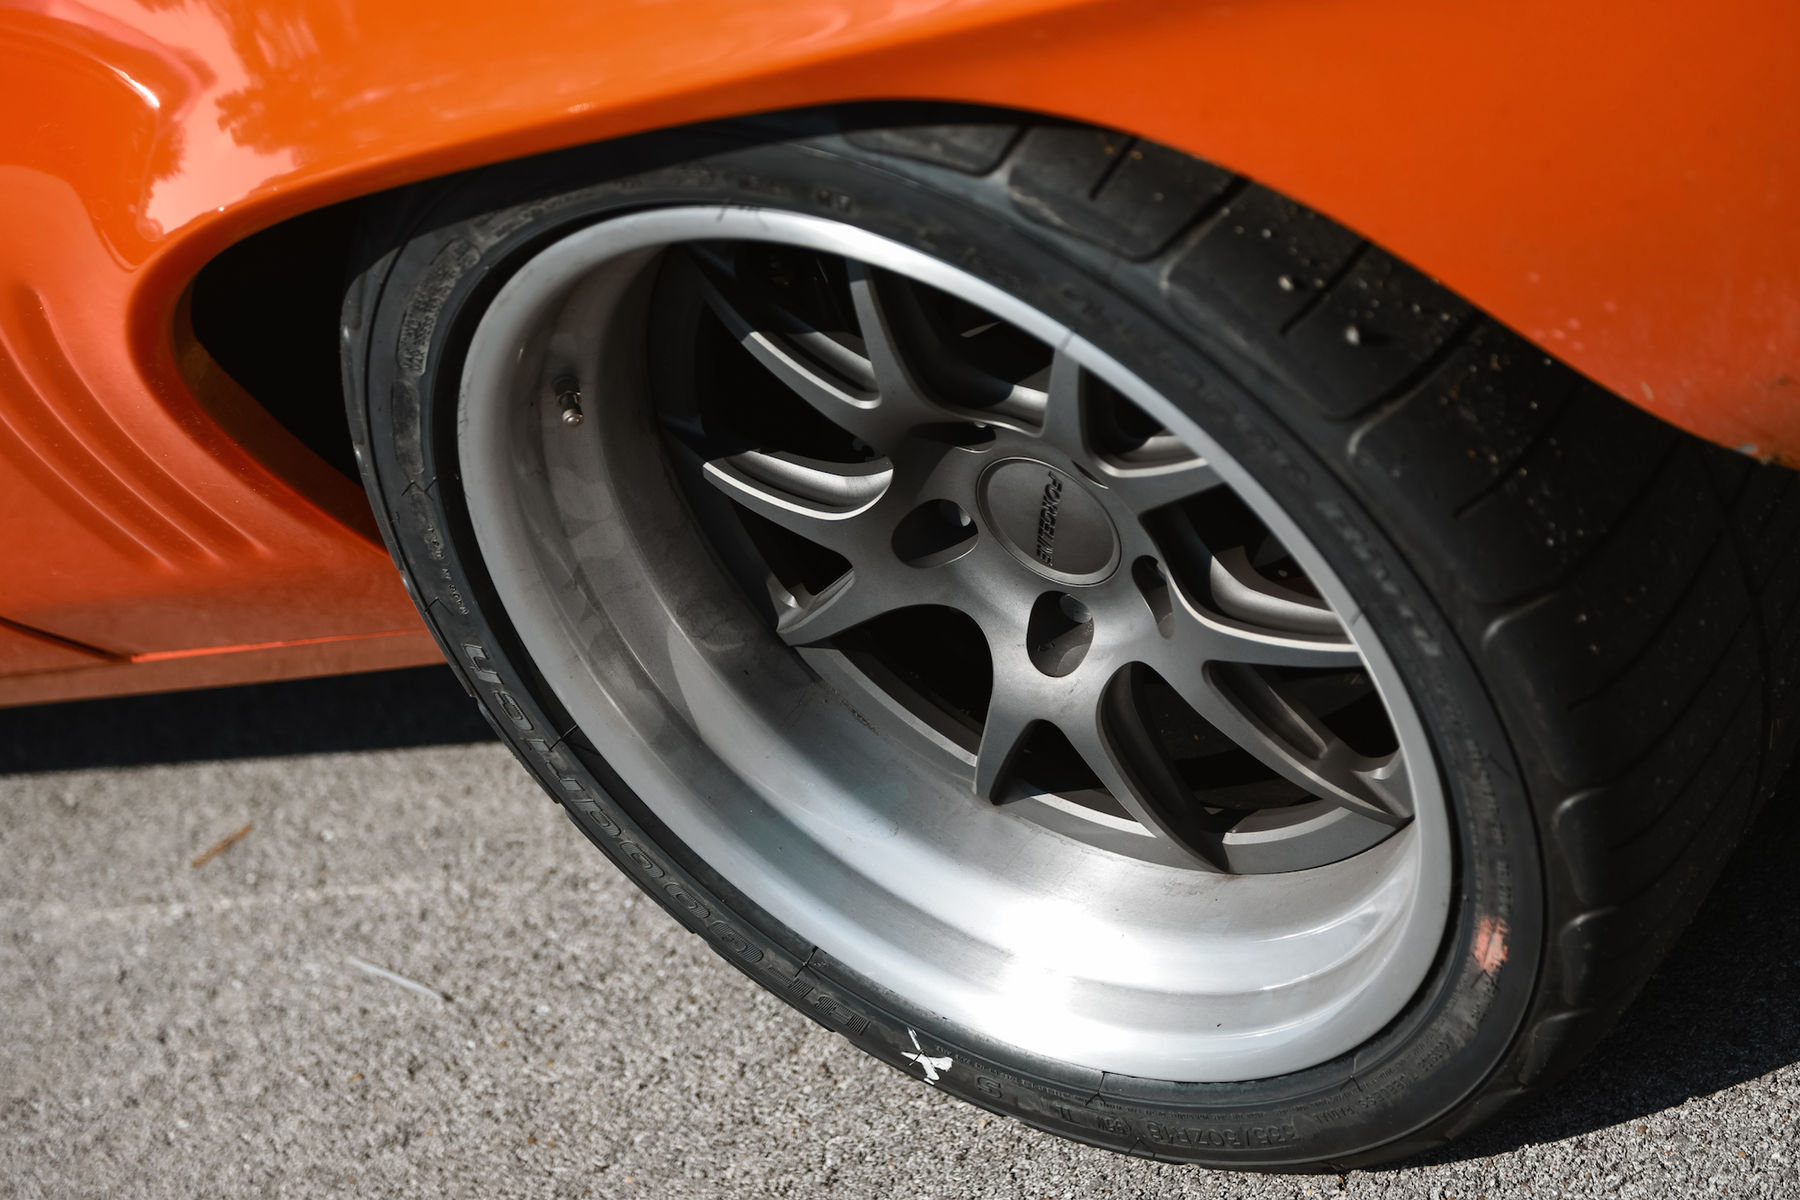 1969 Chevrolet Camaro | Will Hodge's Twin Turbo '69 Camaro on Forgeline GA3 Wheels